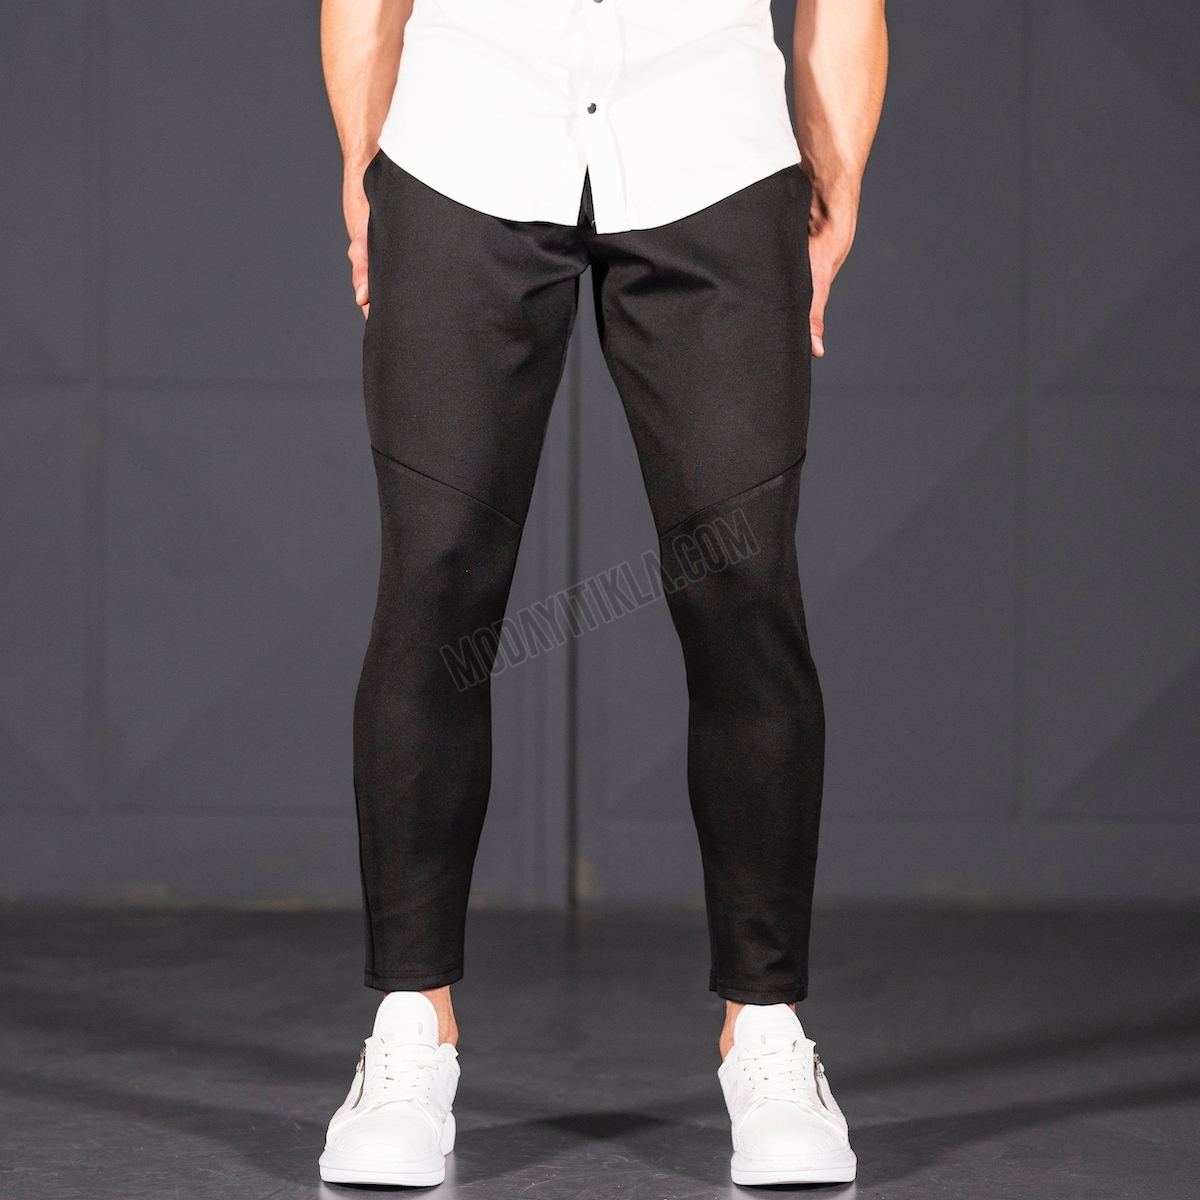 Erkek Dar Paça Fit Çizgi Dikiş Detaylı Siyah Pantolon